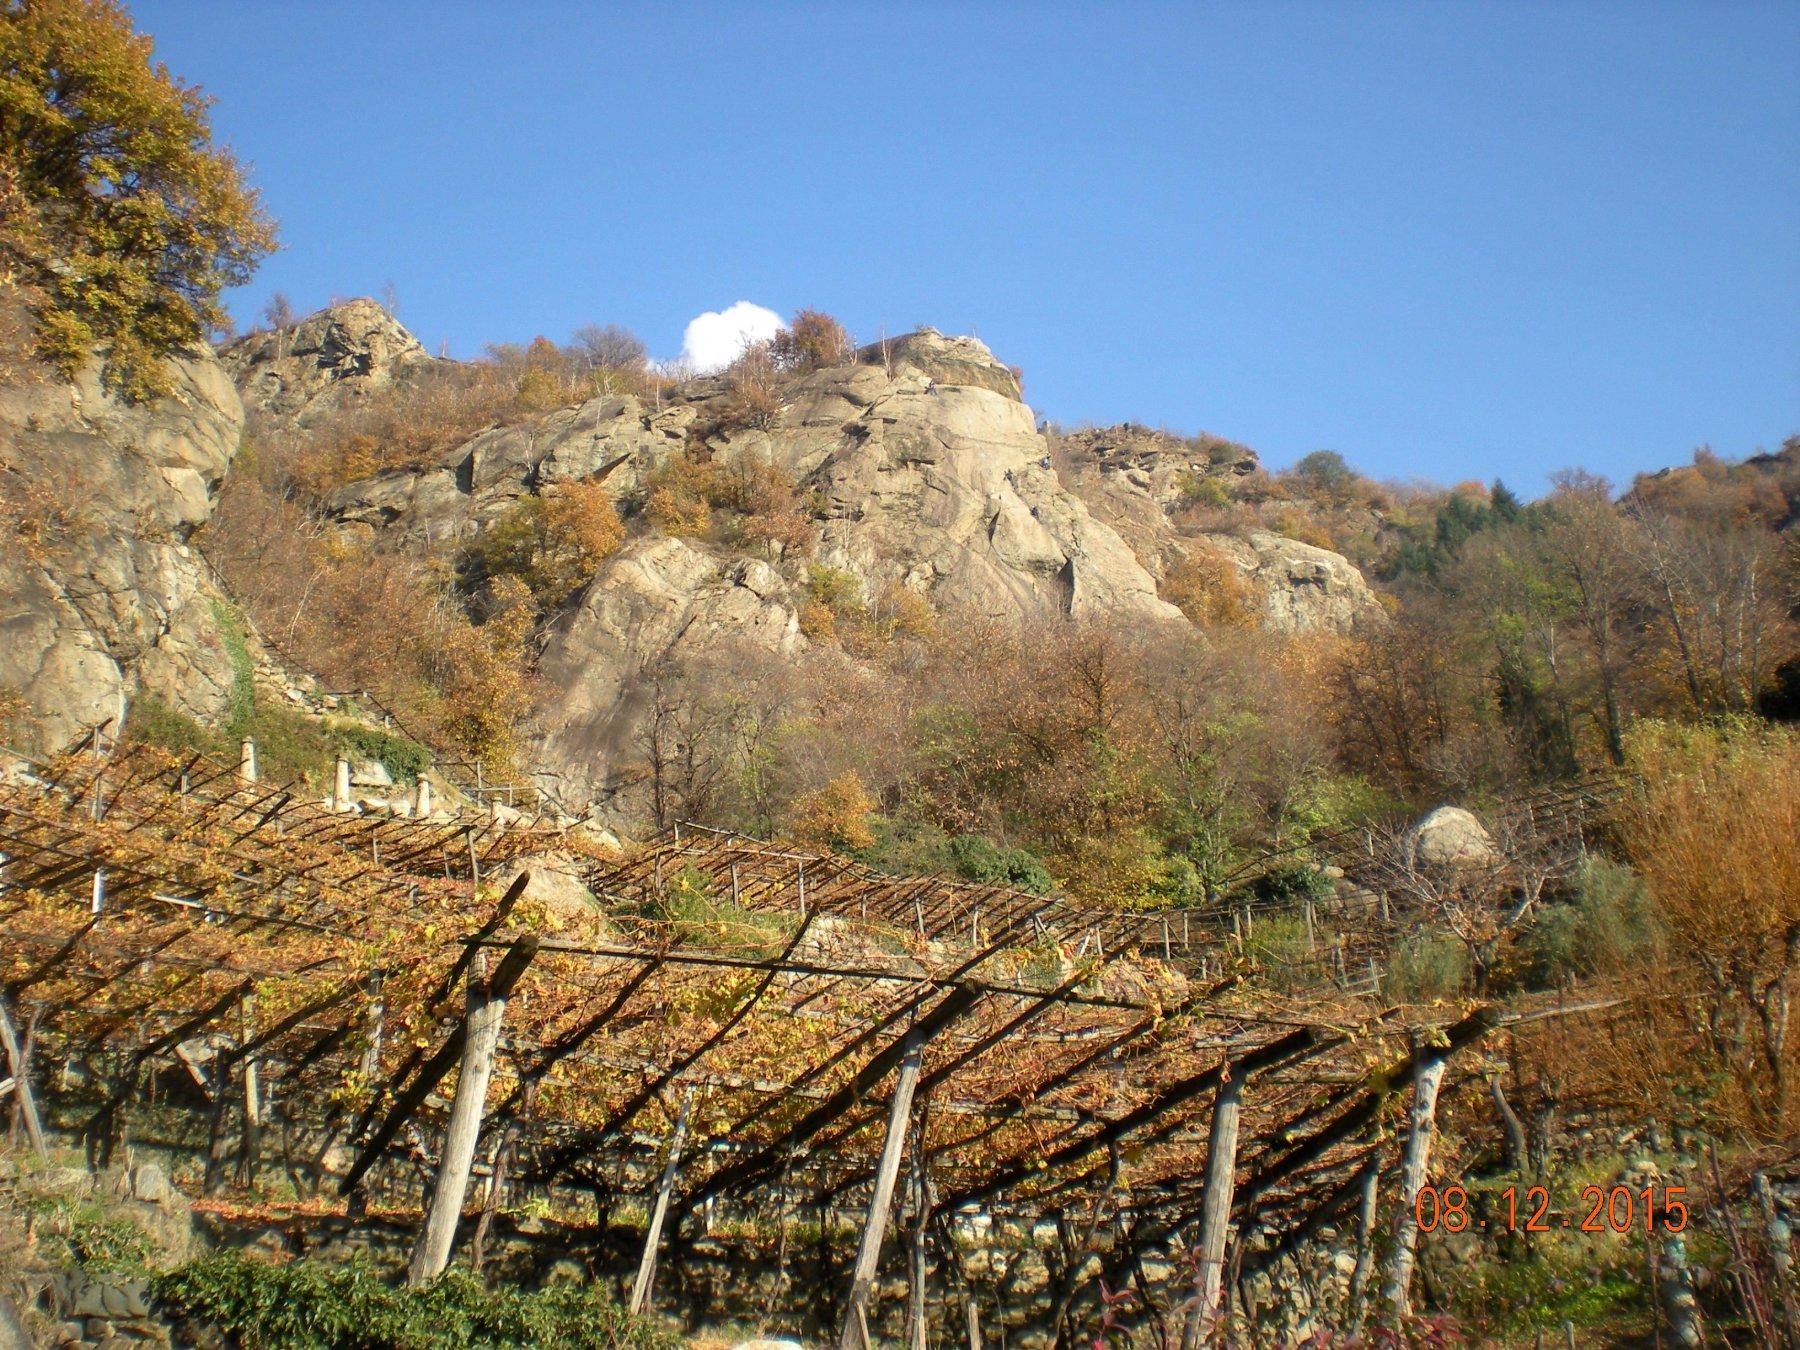 la parete sopra i pregiati vitigni